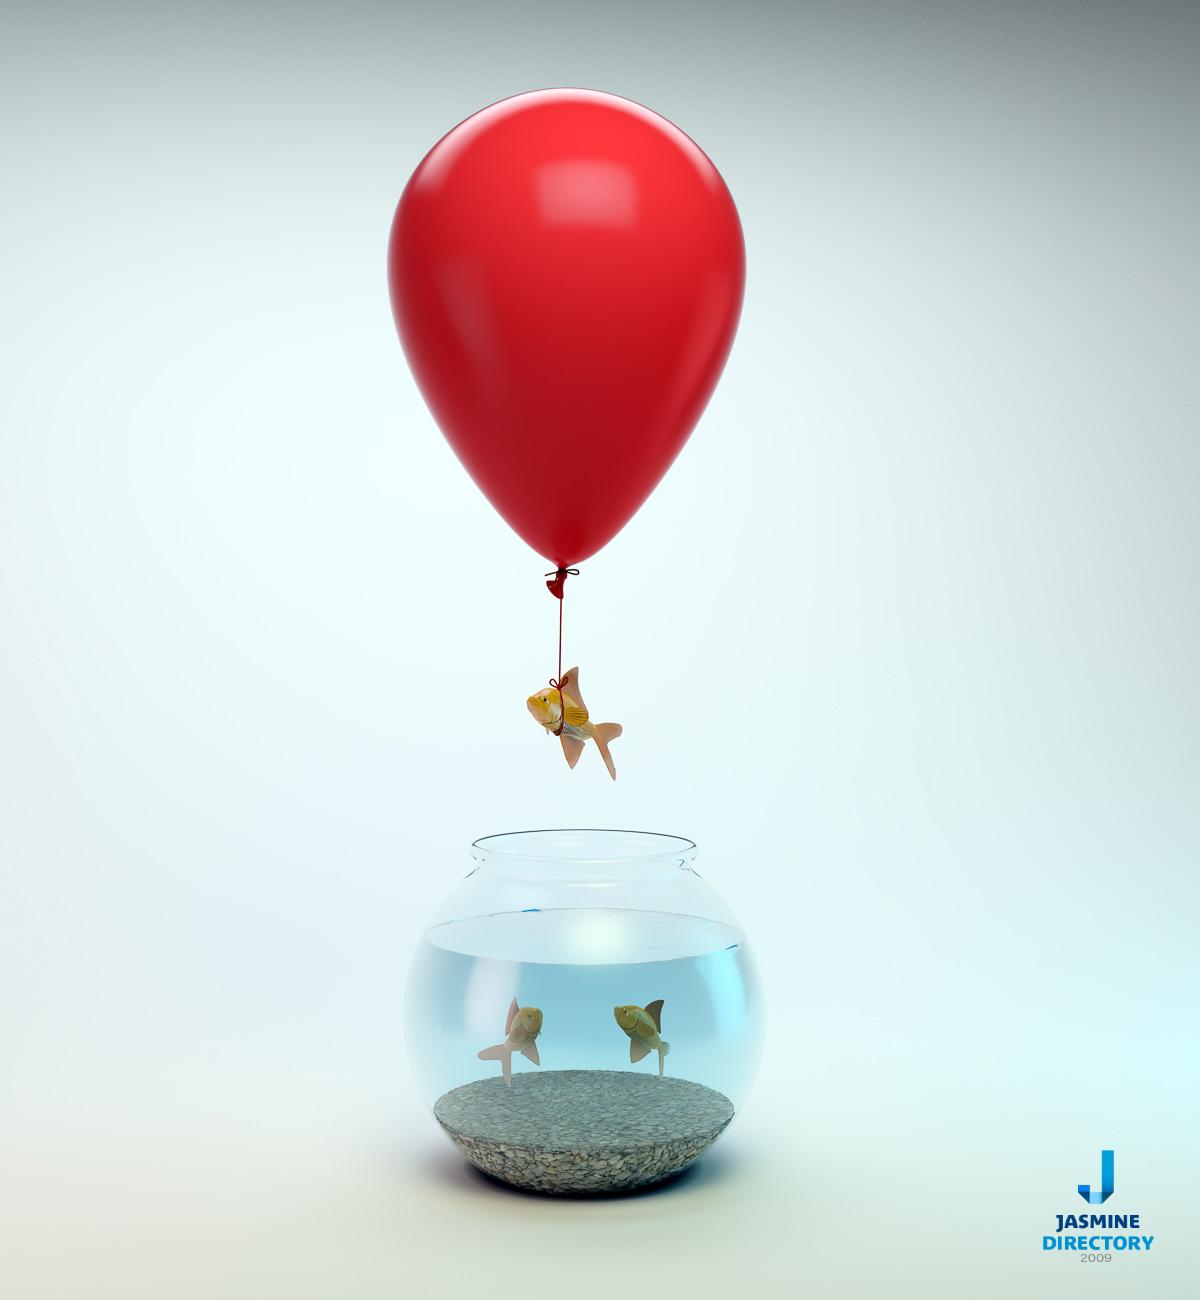 Balloon - Stock photography